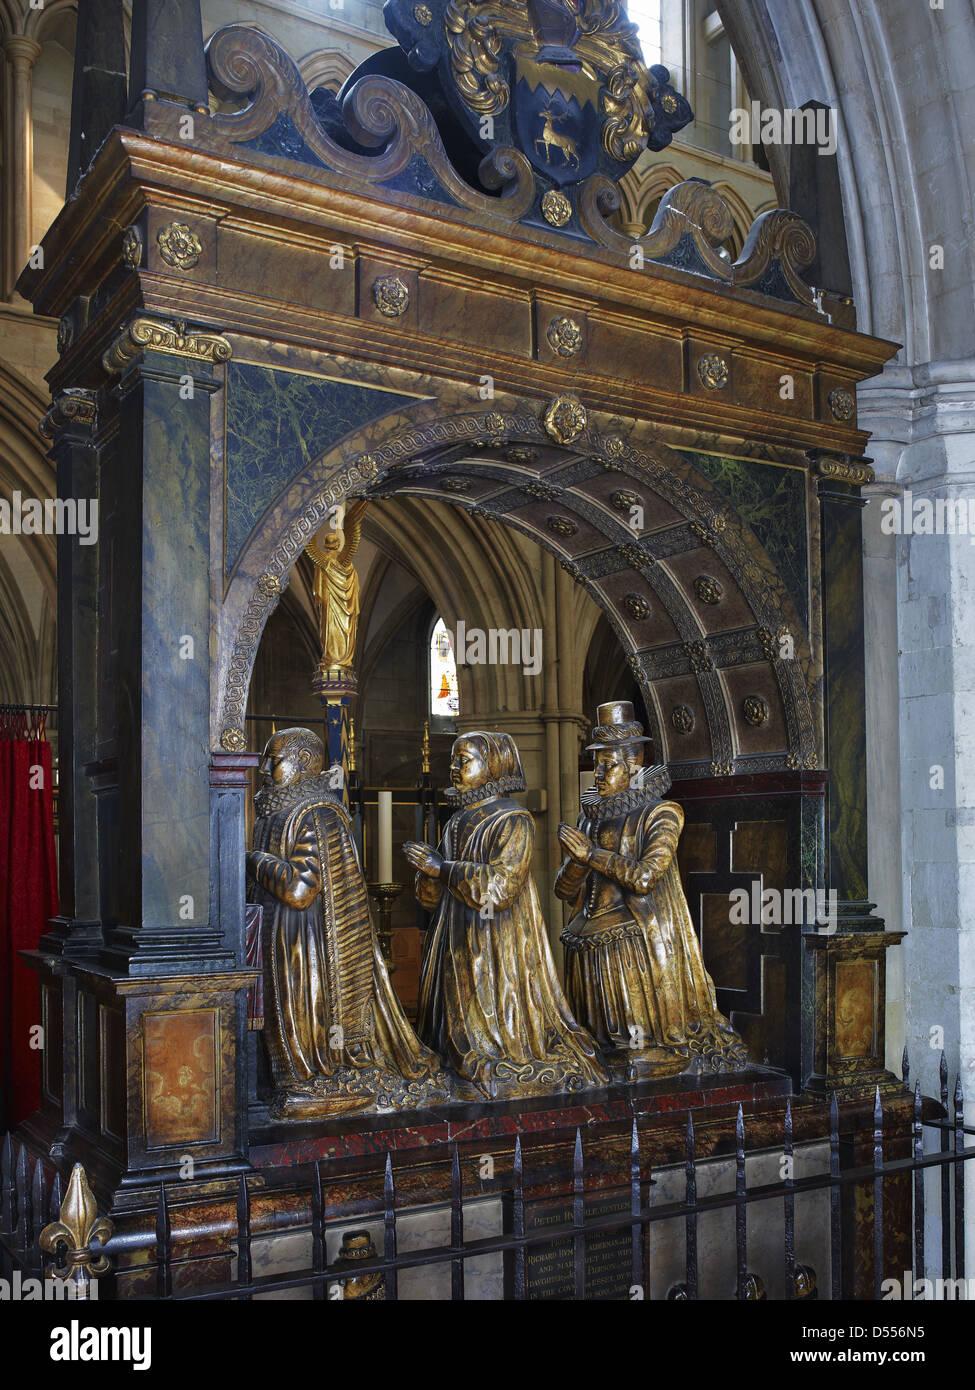 La Catedral de Southwark humilde monumento Imagen De Stock